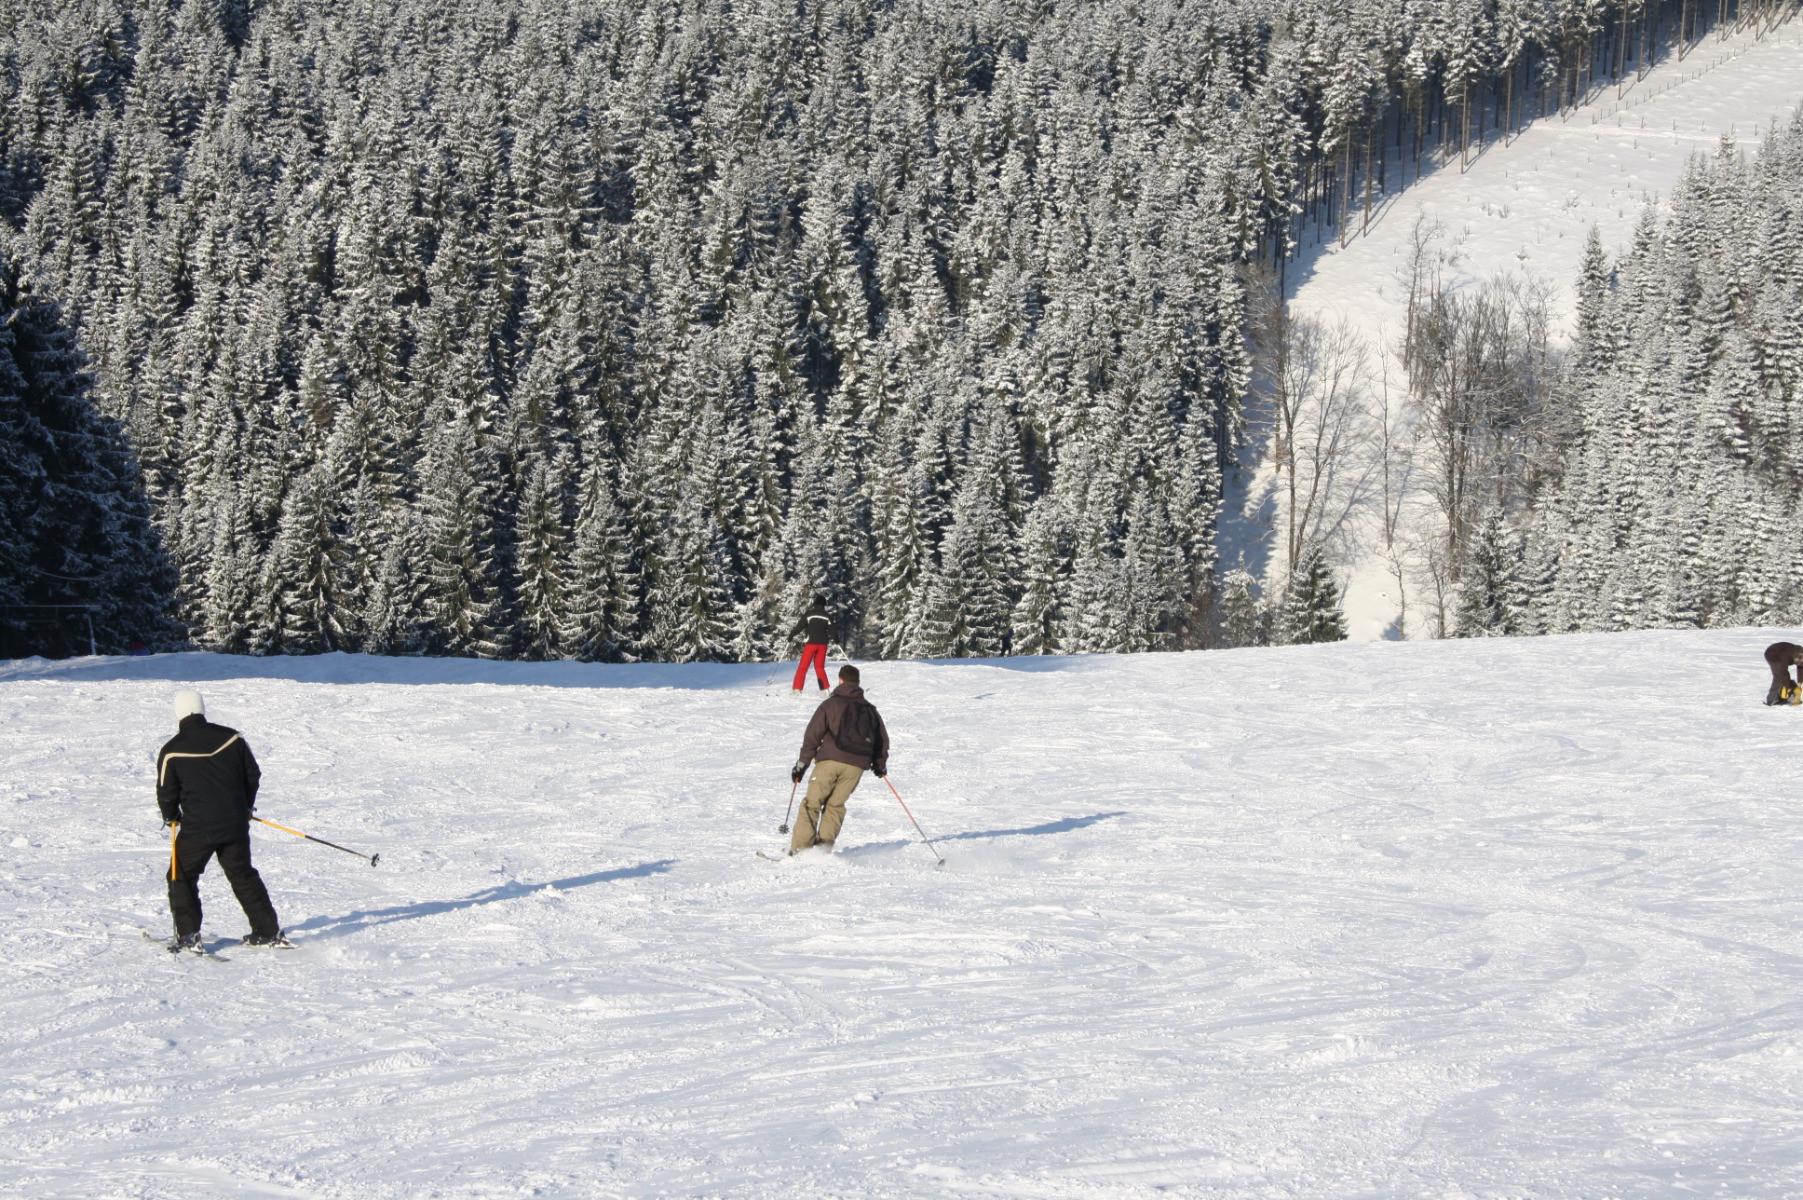 Piste Ski Alpin Ovifatundefined